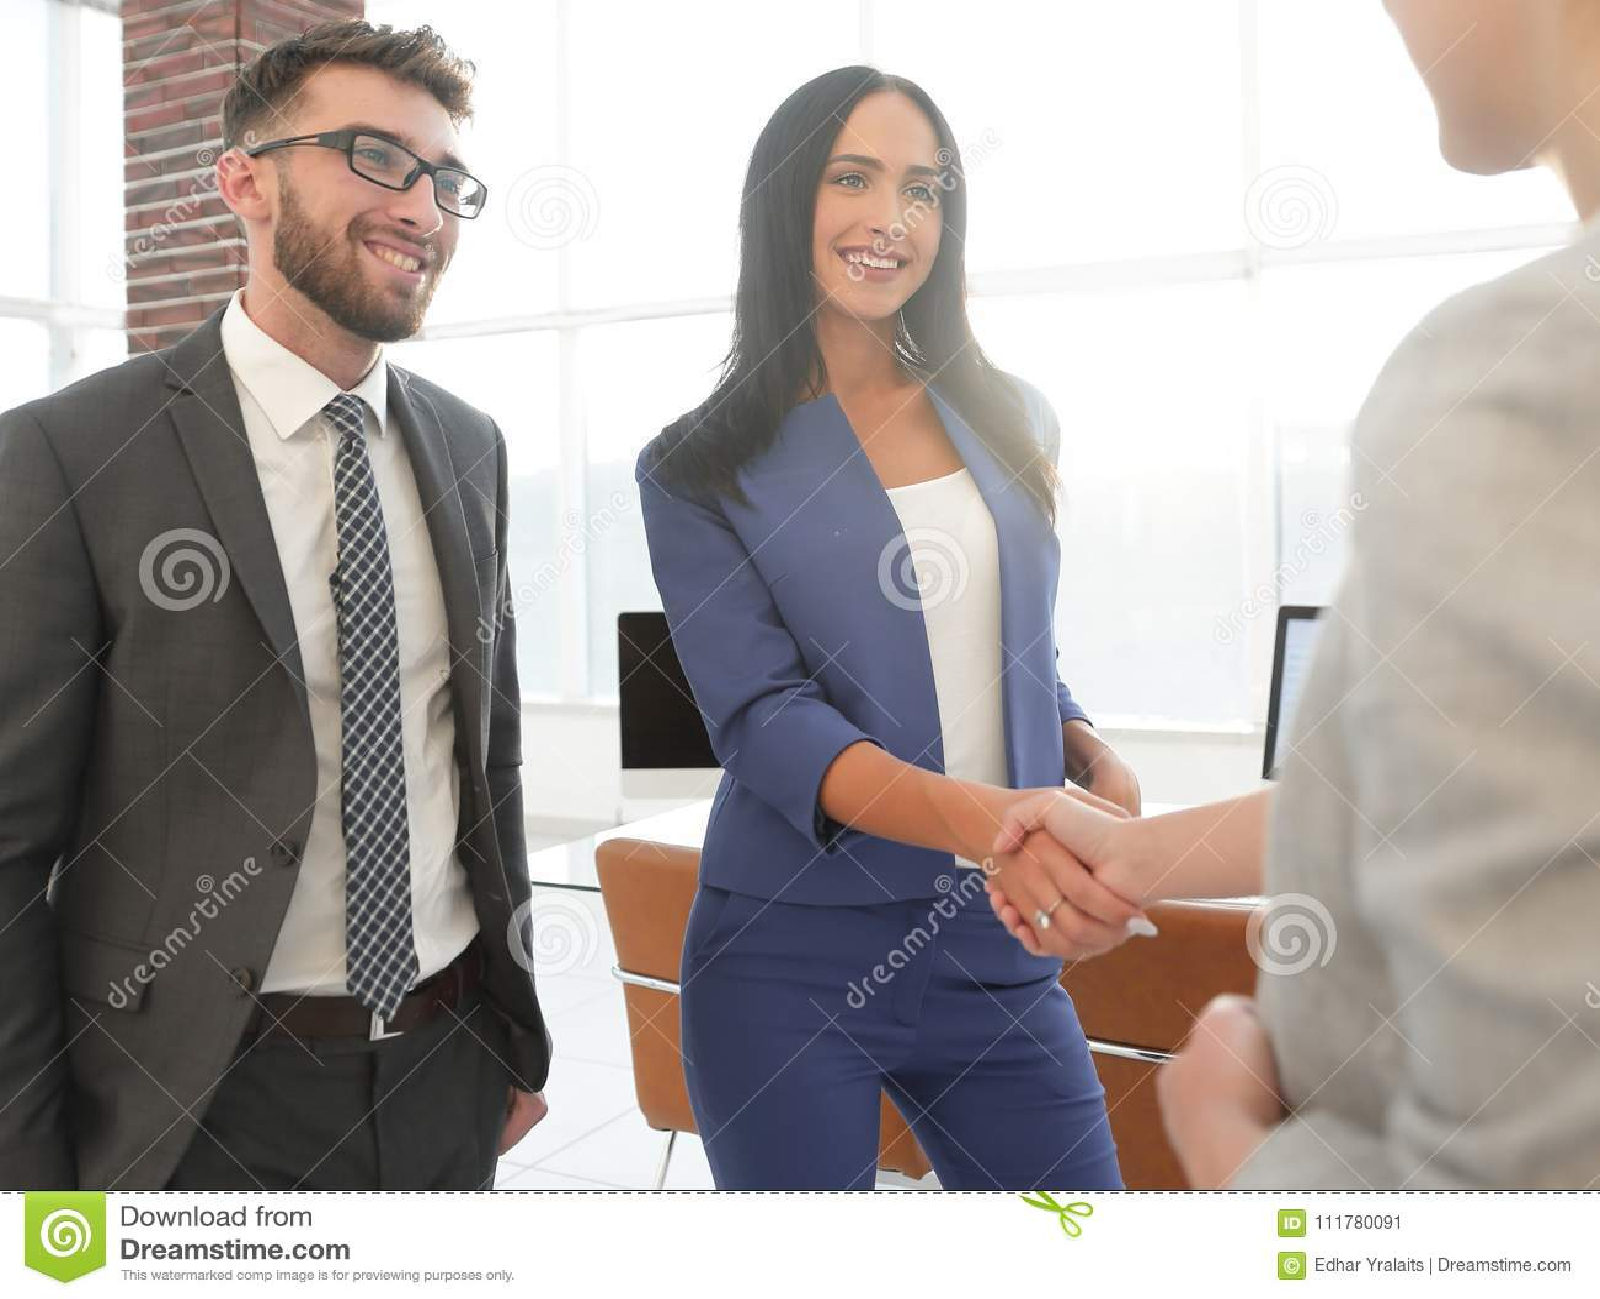 Two beautiful businesswomen handshaking in office